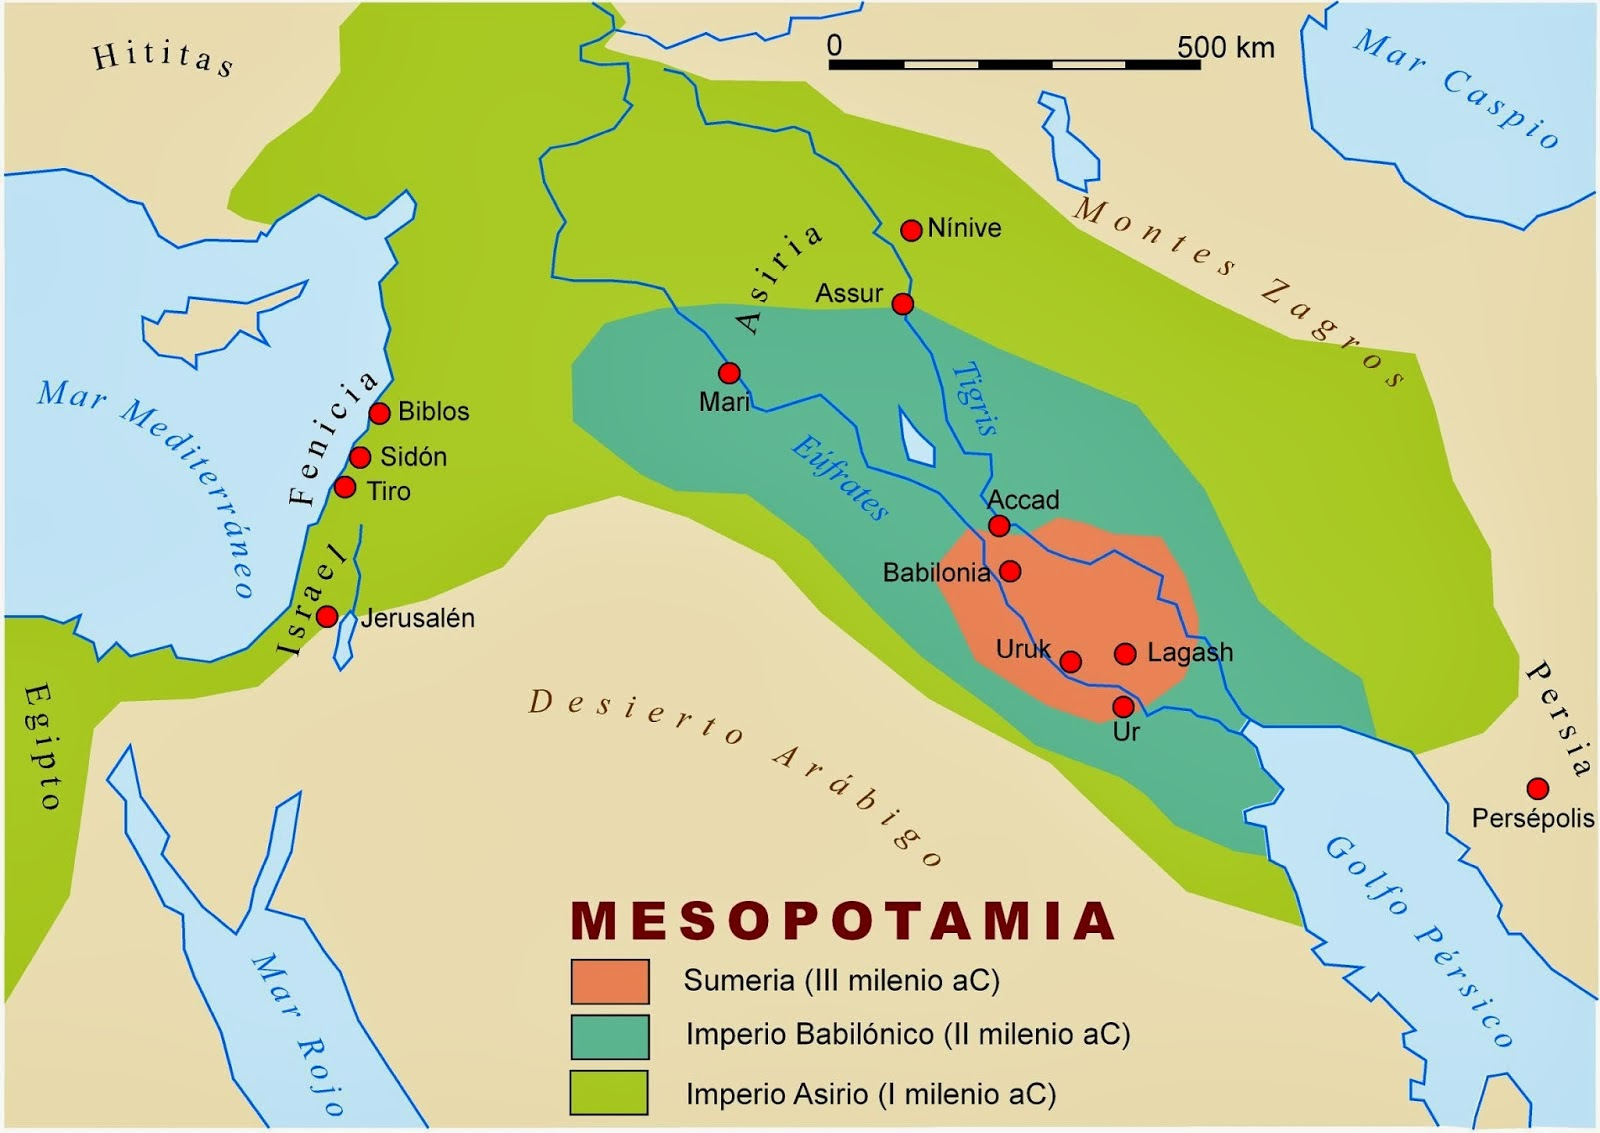 Mapa de mesopotamia mapa f sico geogr fico pol tico - Donde estudiar pintura ...